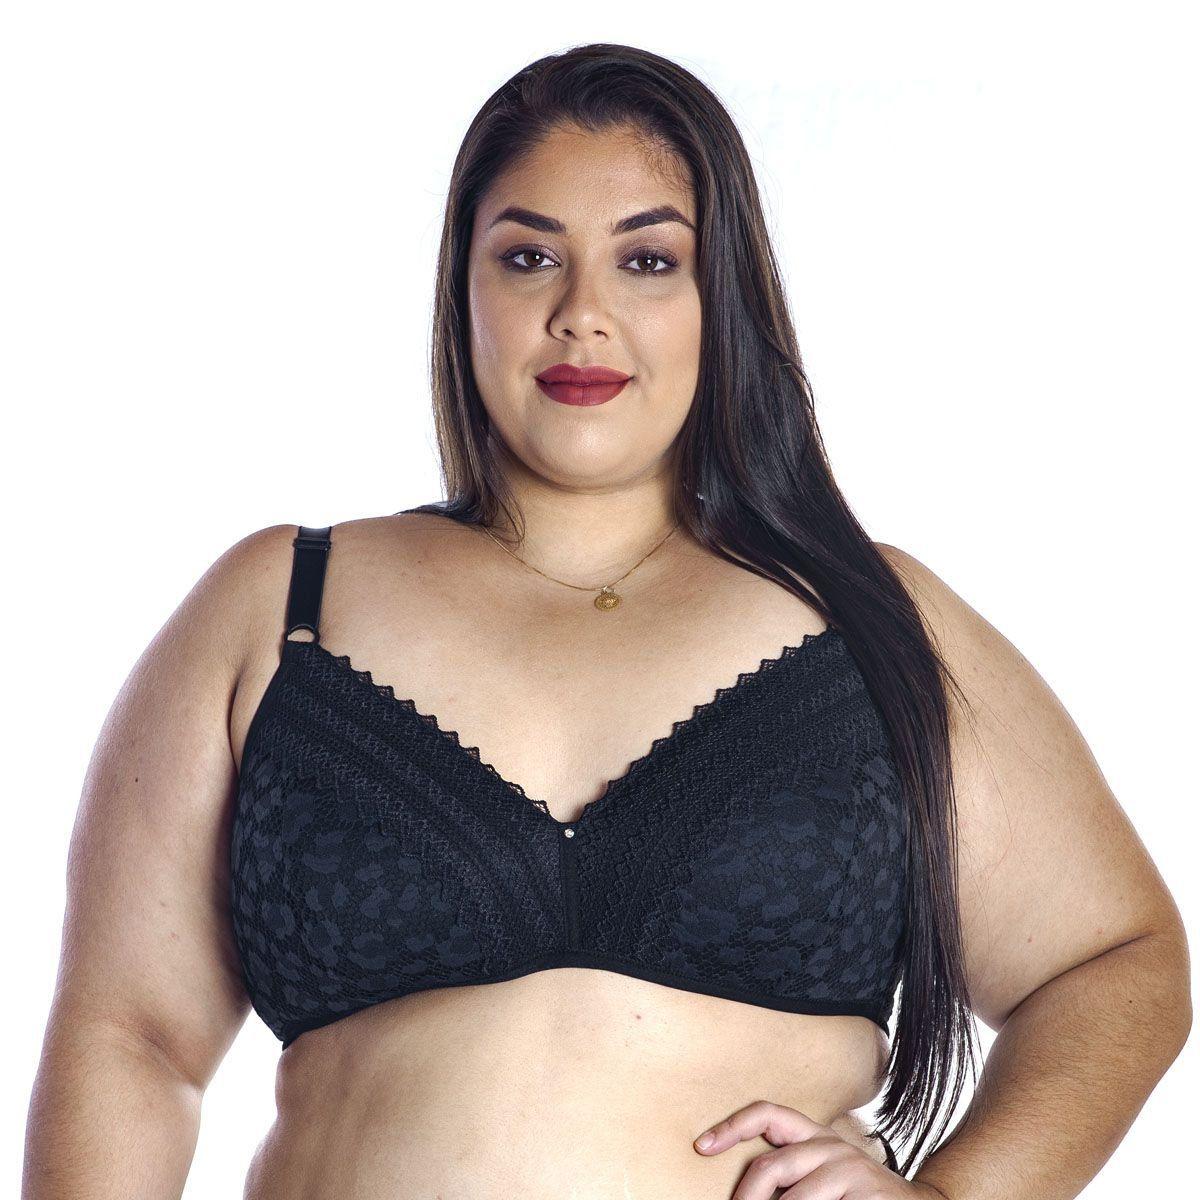 Sutiã Plus Size Bojo Confort Linha Única Nayane Rodrigues .